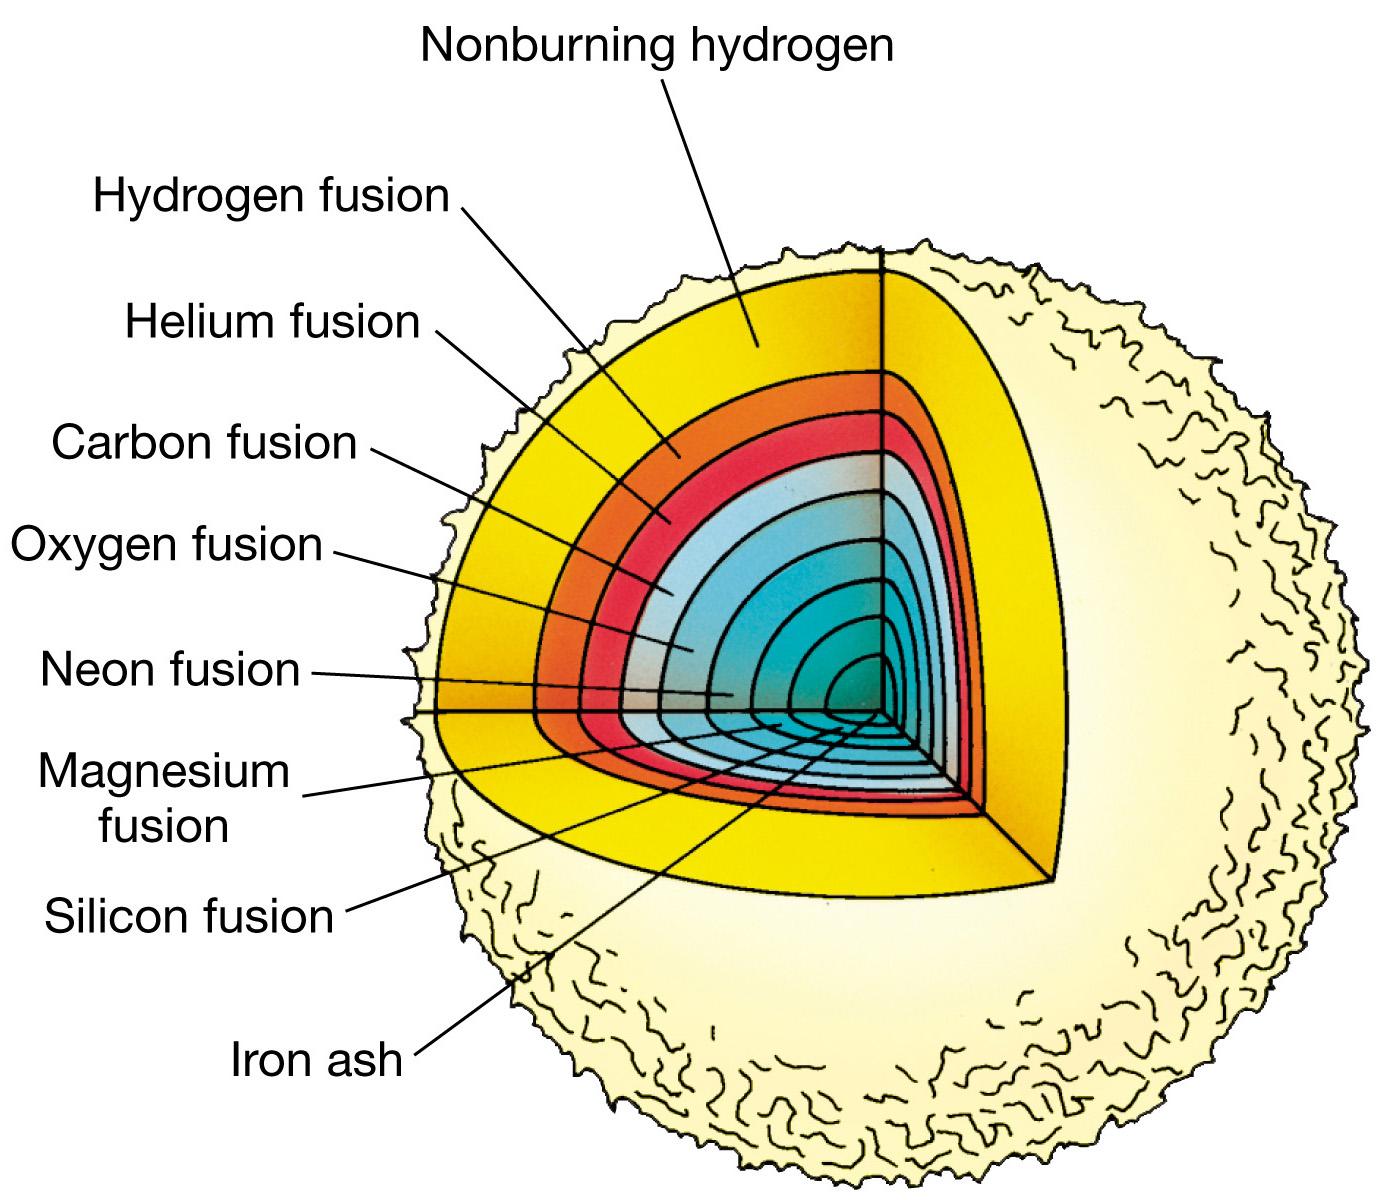 5187e274 59a2 49bf 8389 8b2fbda7f863?t=1476553620718 the hertzsprung russell diagram cosmos